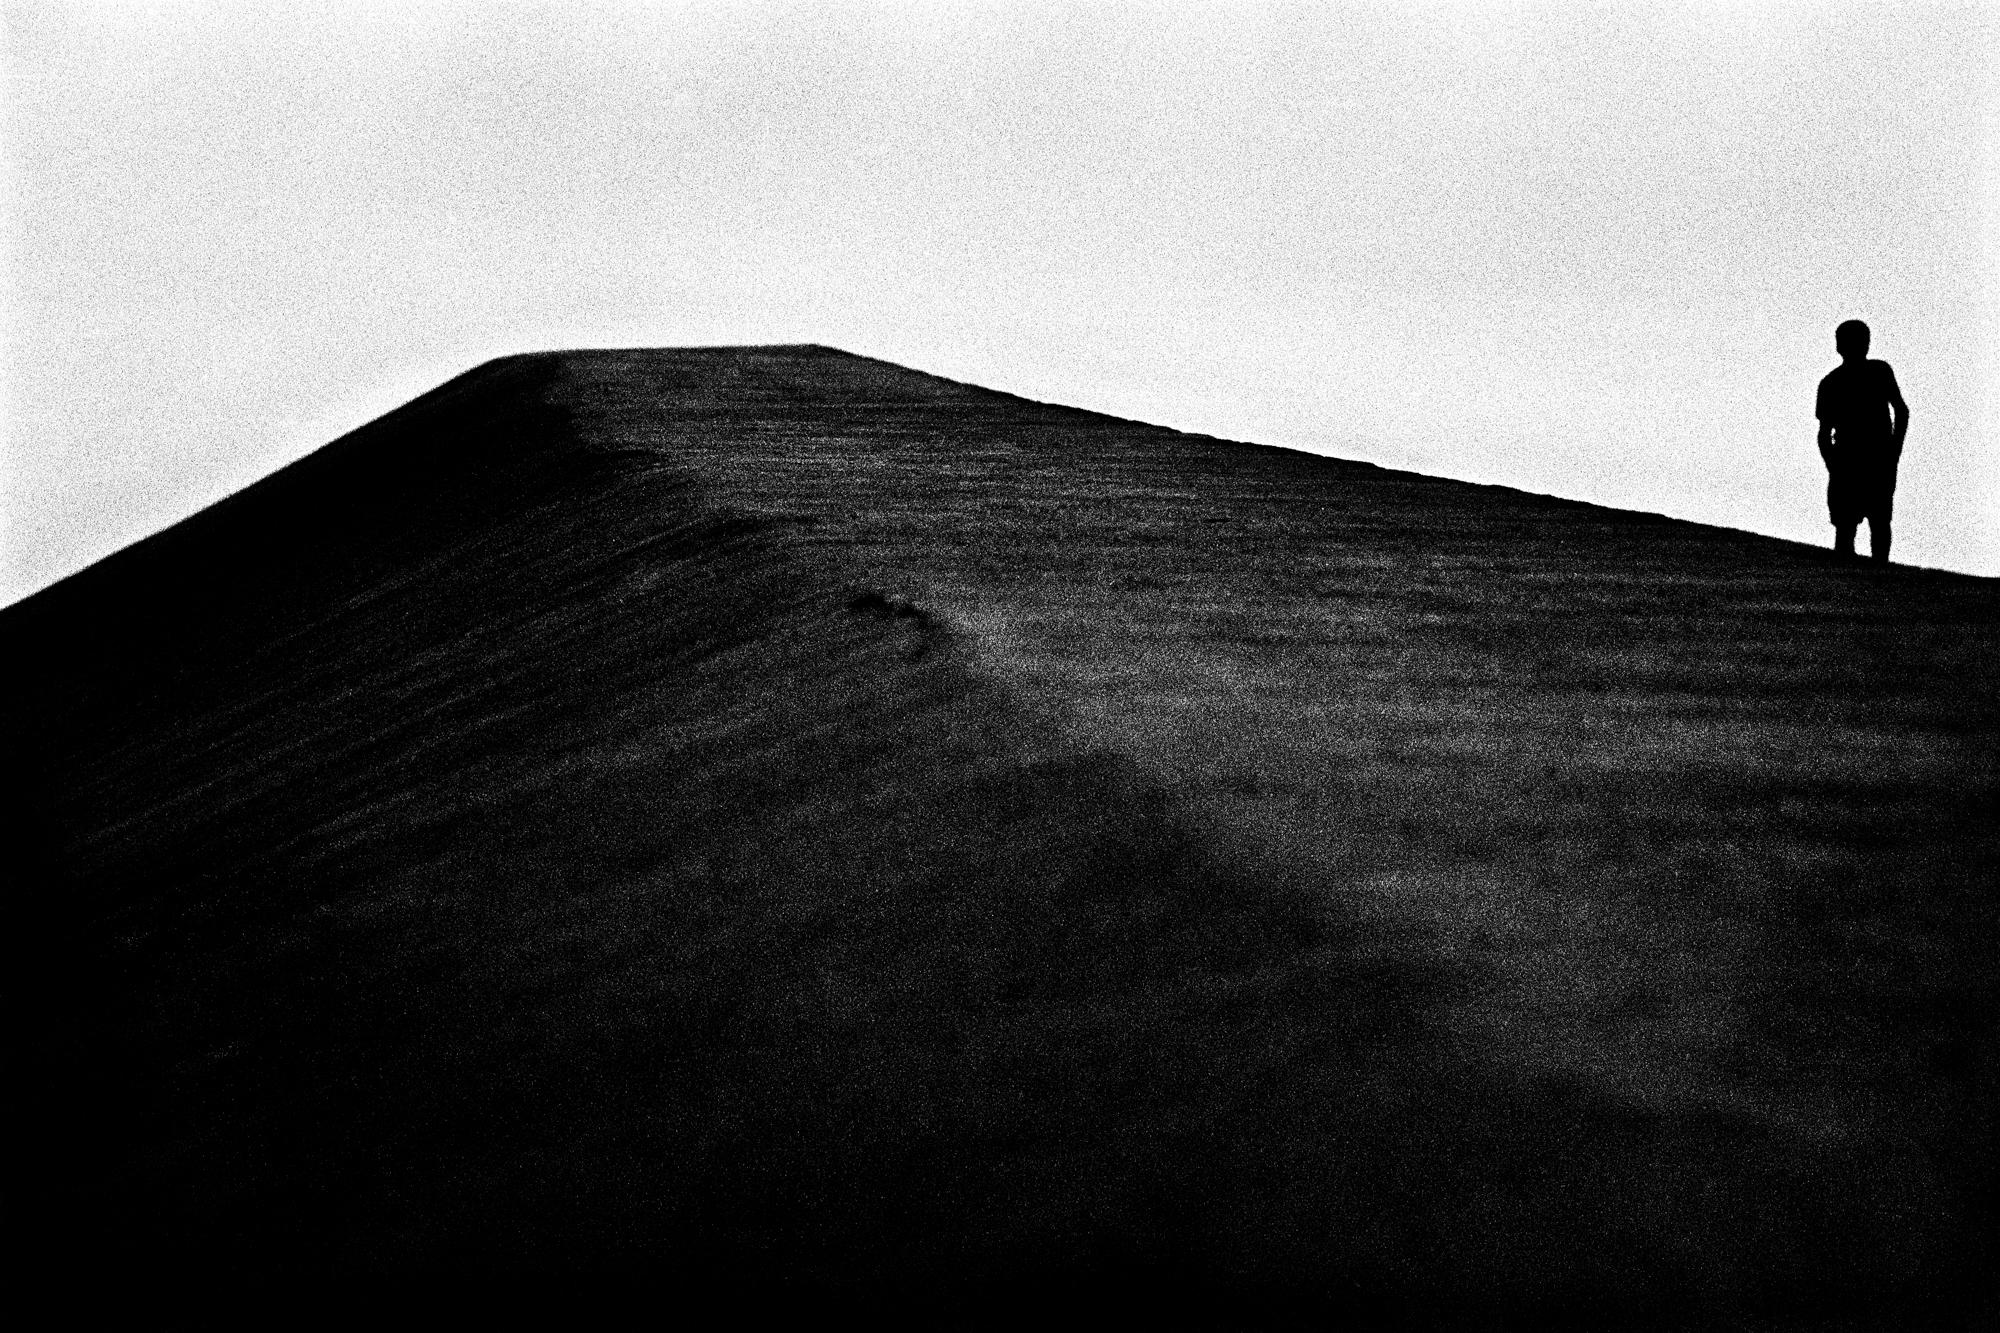 concrete mountain fullres new-Edit.jpg